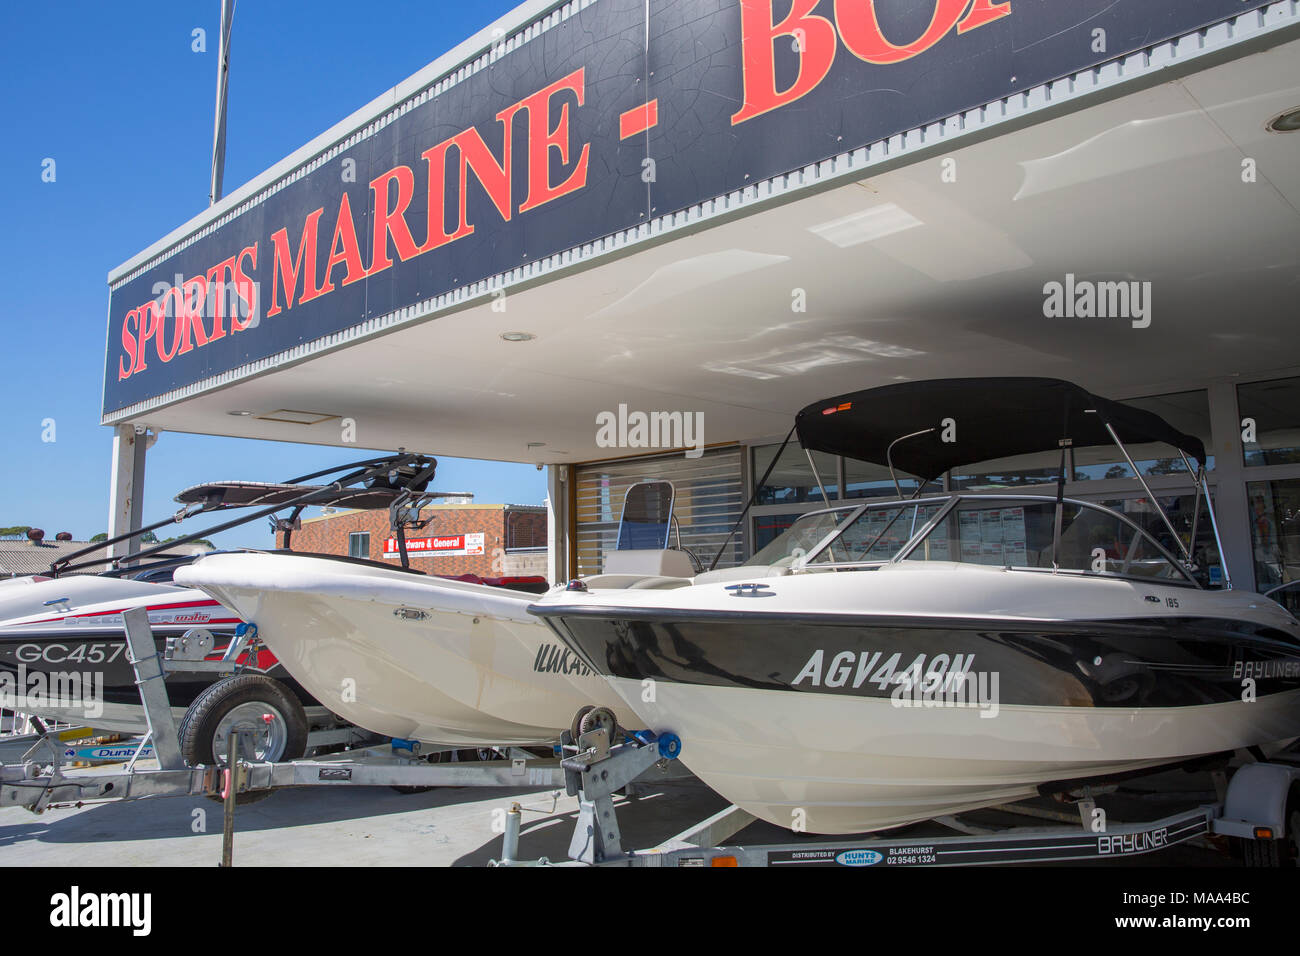 Power motor boats for sale at a boatyard in Sydney,Australia